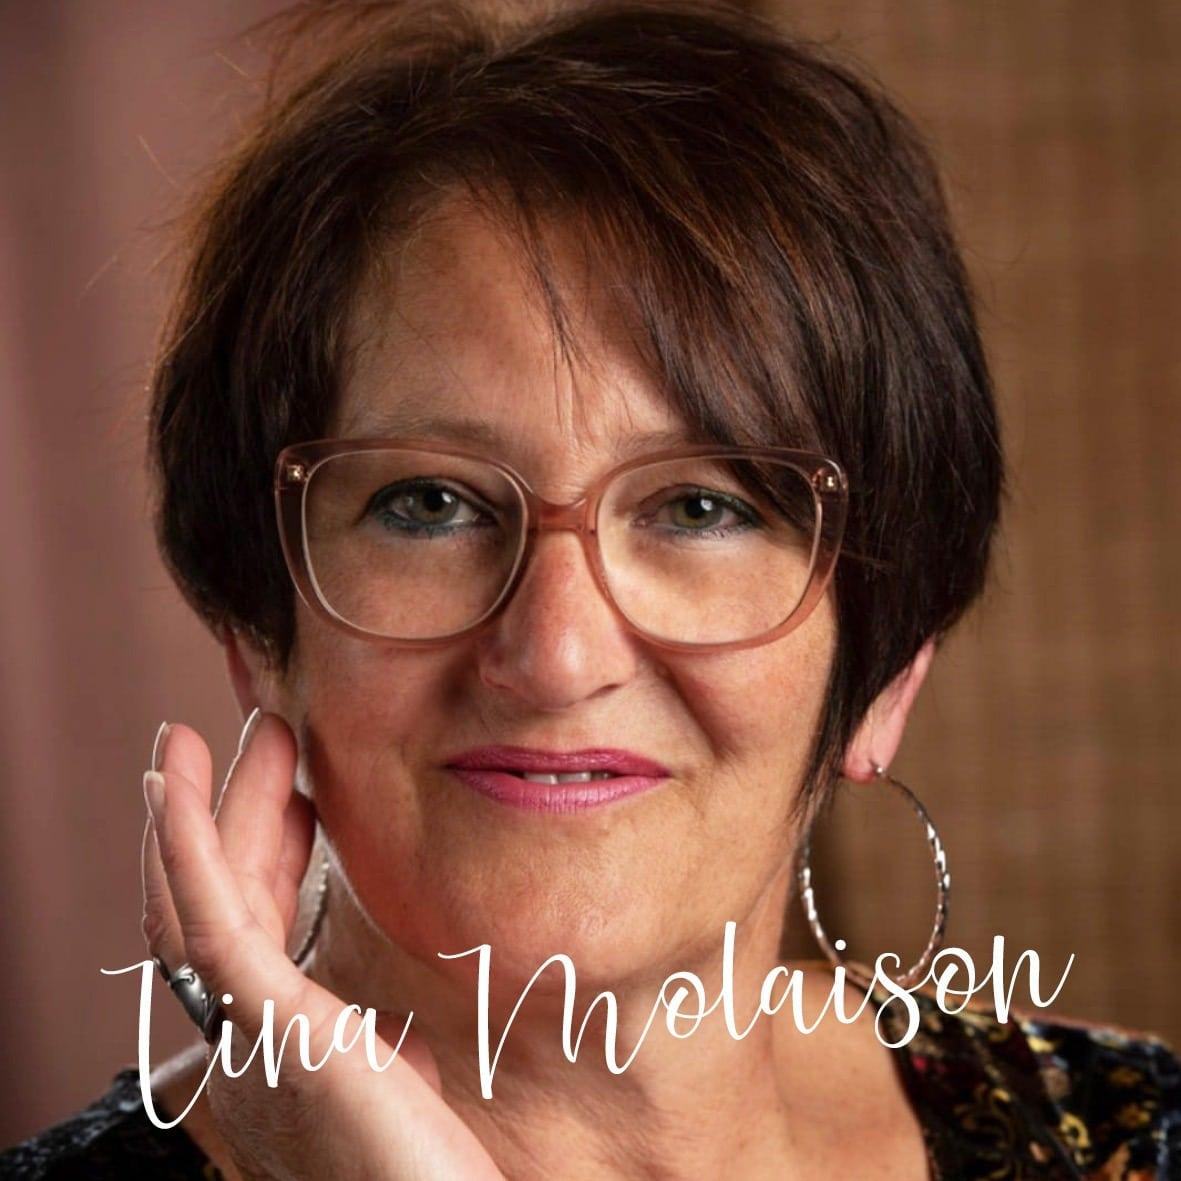 Lina Molaison de Manu Factum